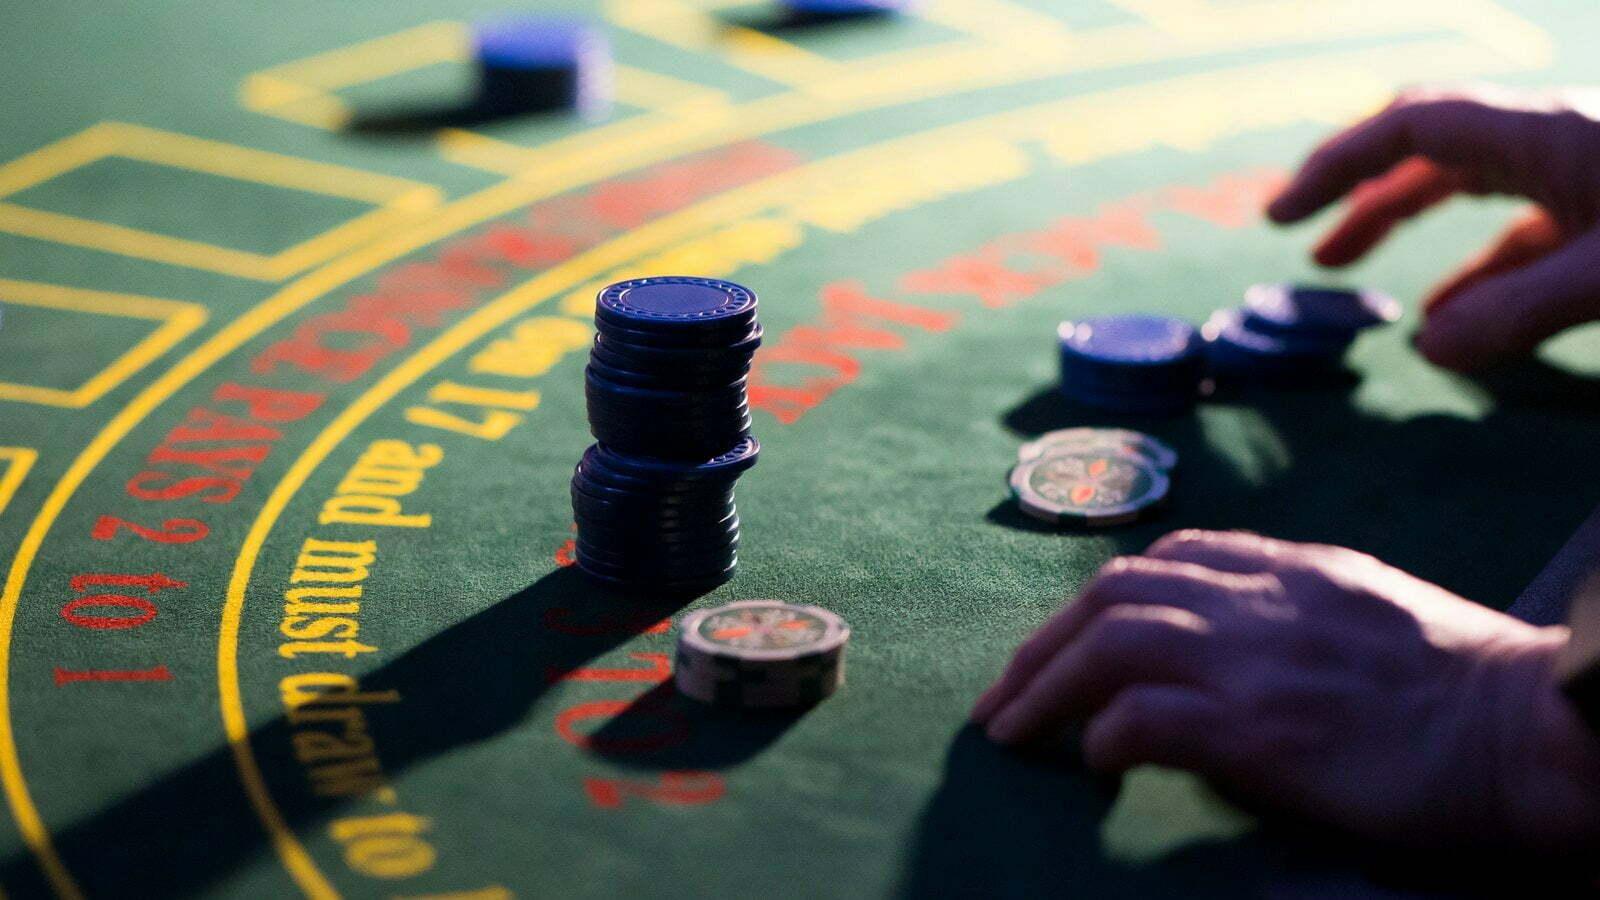 UK Gambling Act 2005 Formal Review Underway